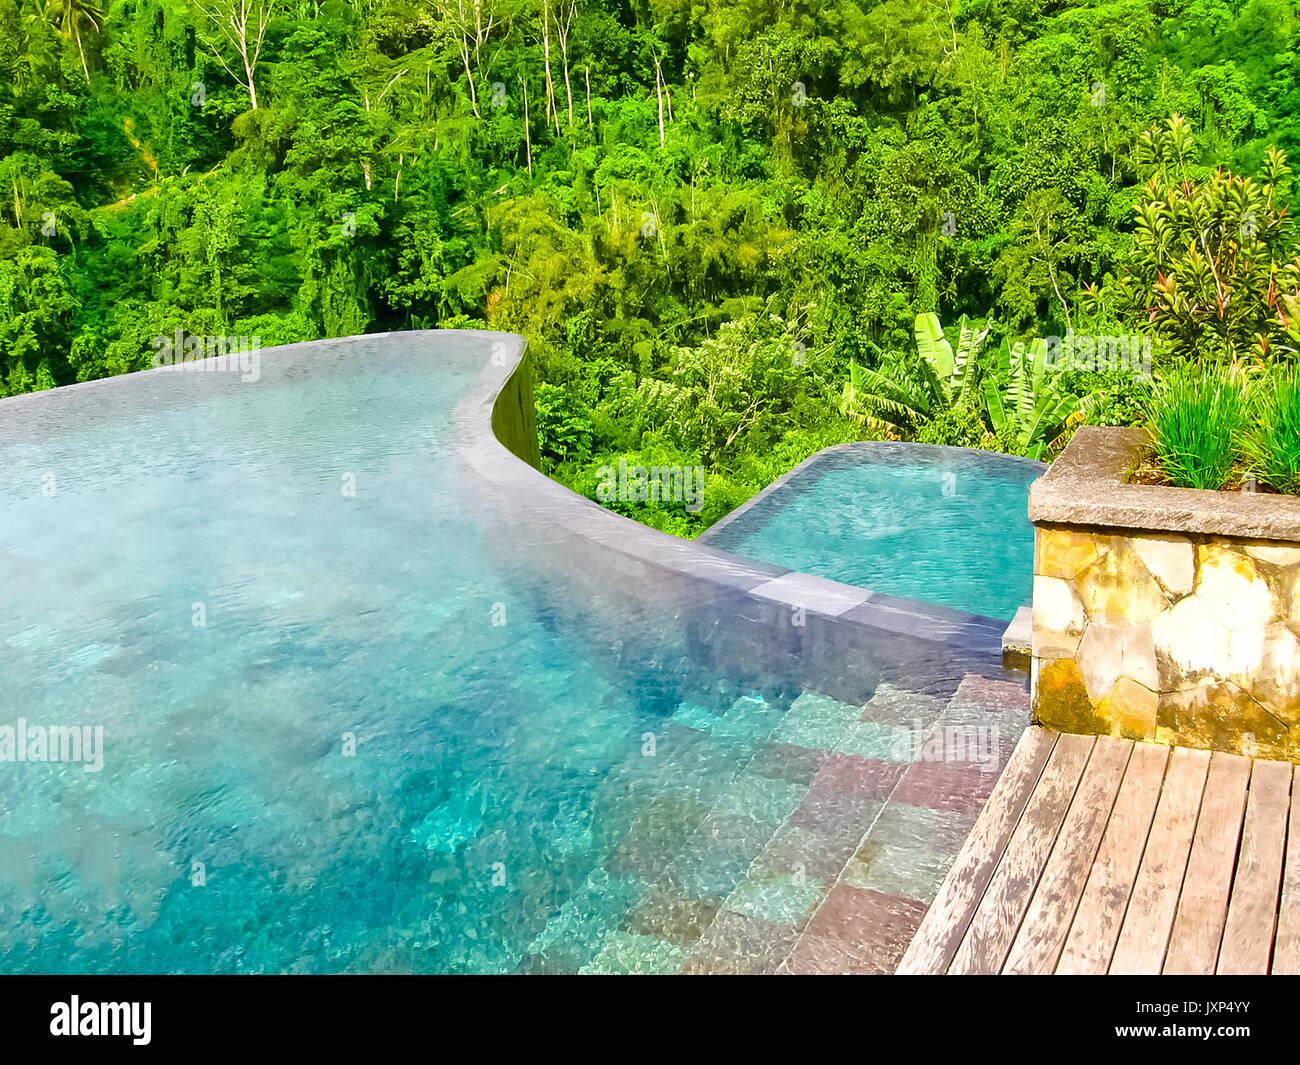 Bali, Indonesia - April 13, 2014: View of swimming pool at Ubud Hanging Gardens hotel - Stock Image